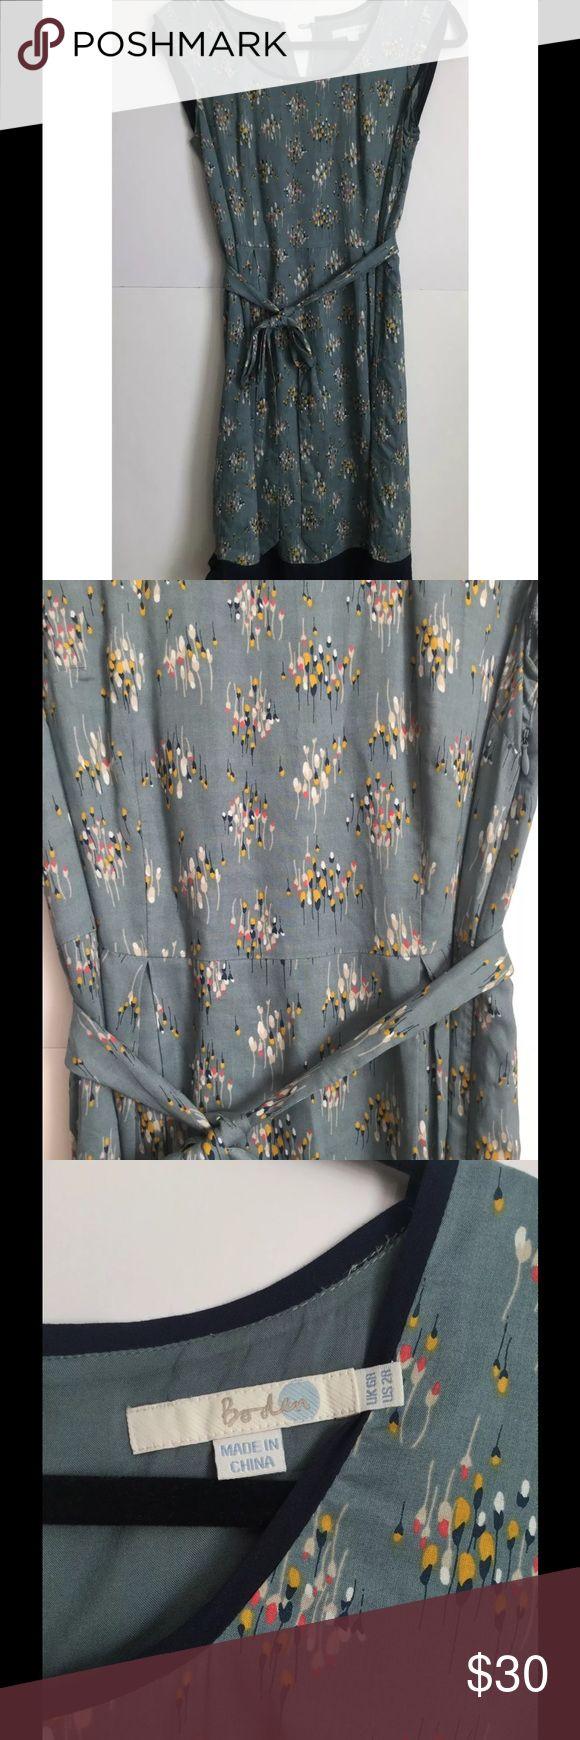 Boden pattern dress size 2R Beautiful Boden dress size 2R Boden Dresses